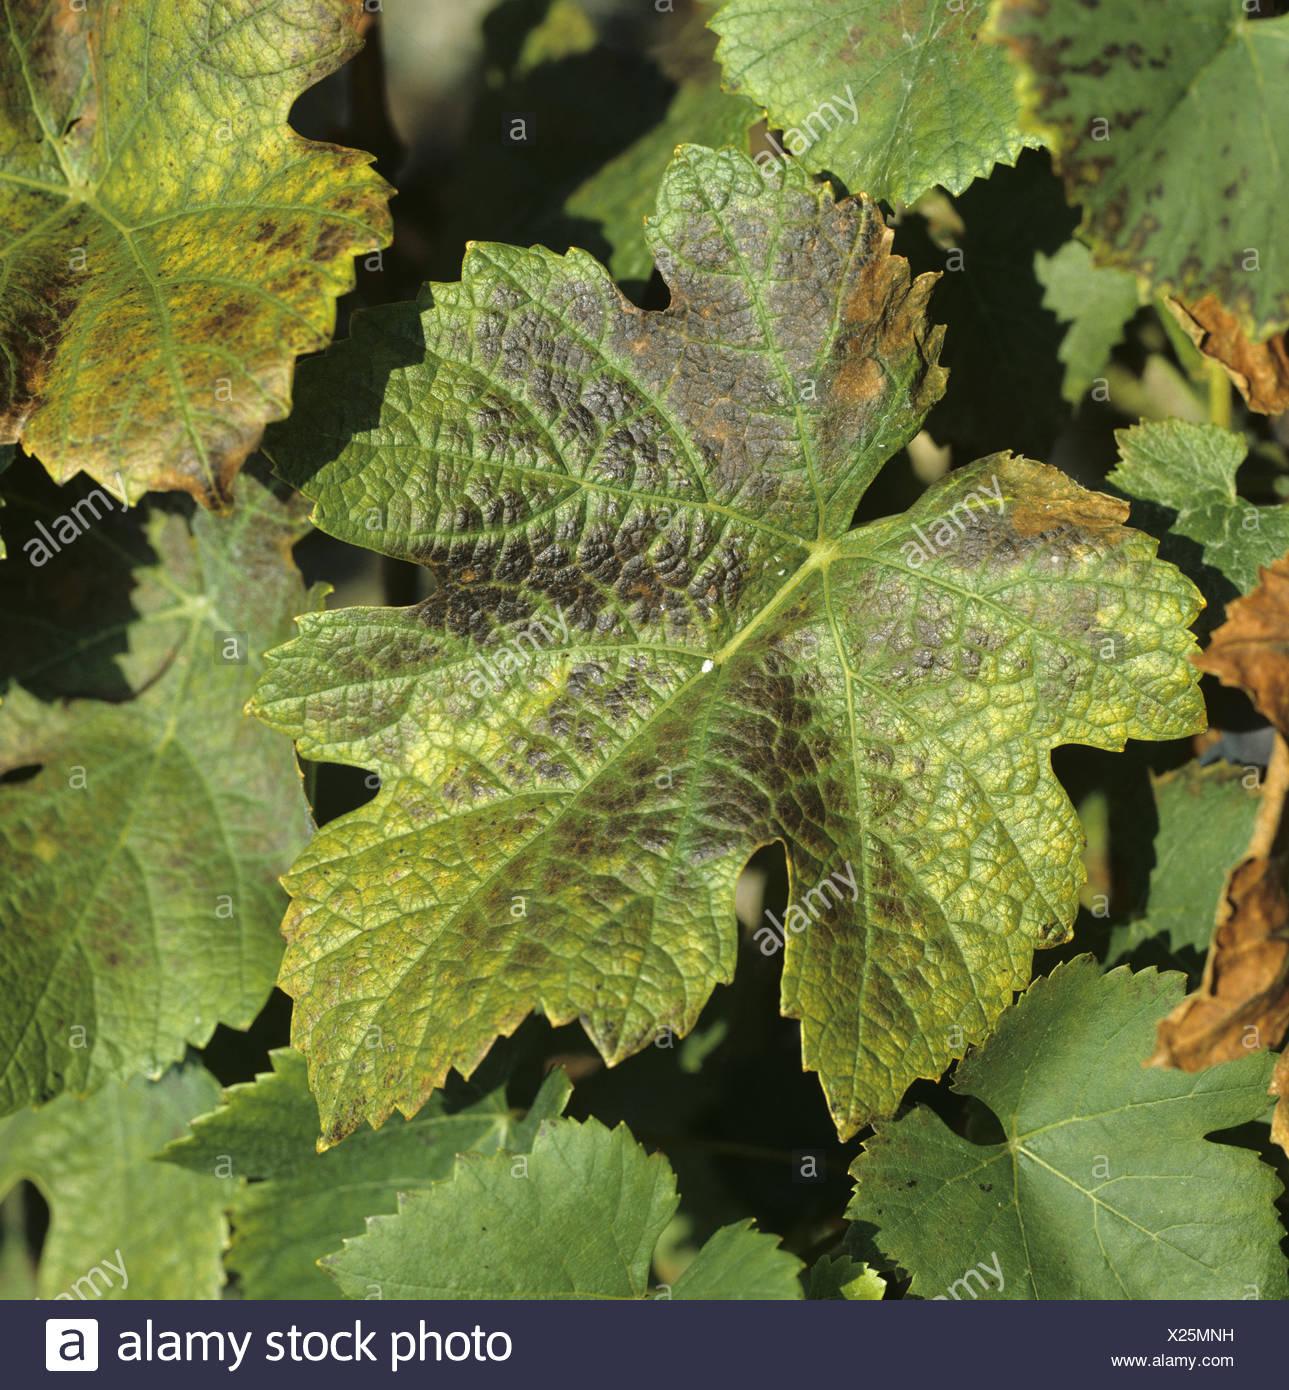 Manganese symptoms on Pinot Noir grapevine leaf - Stock Image